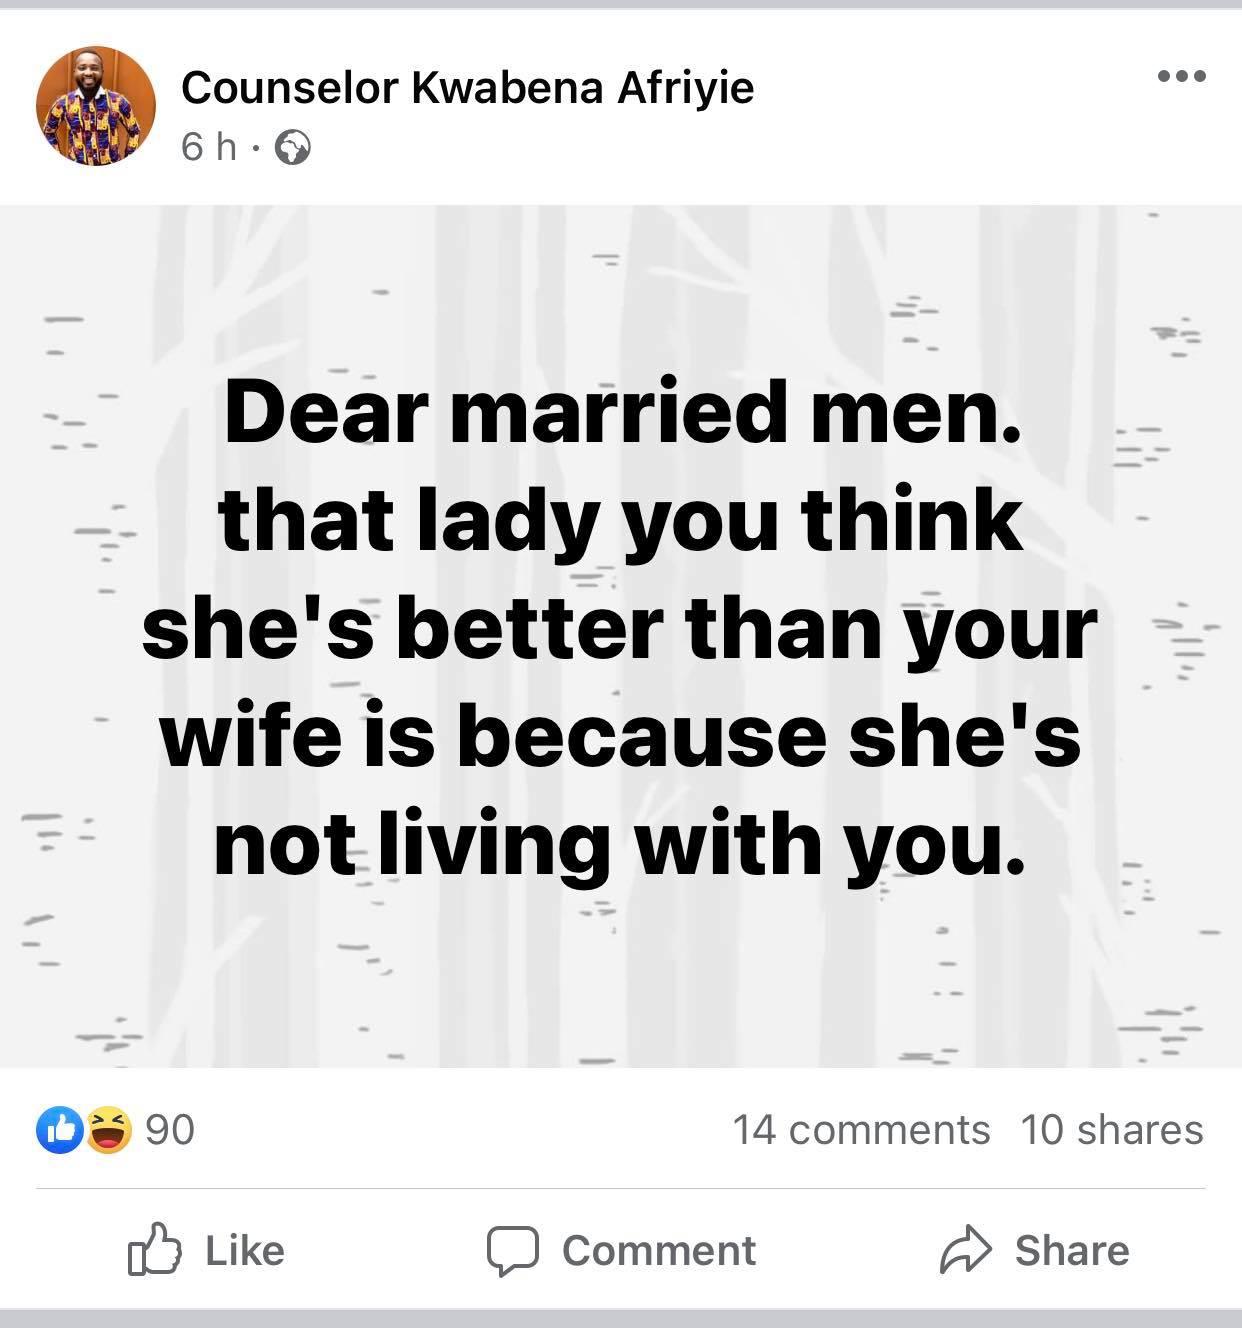 counselor%2Bkwabena%2Bafriyie